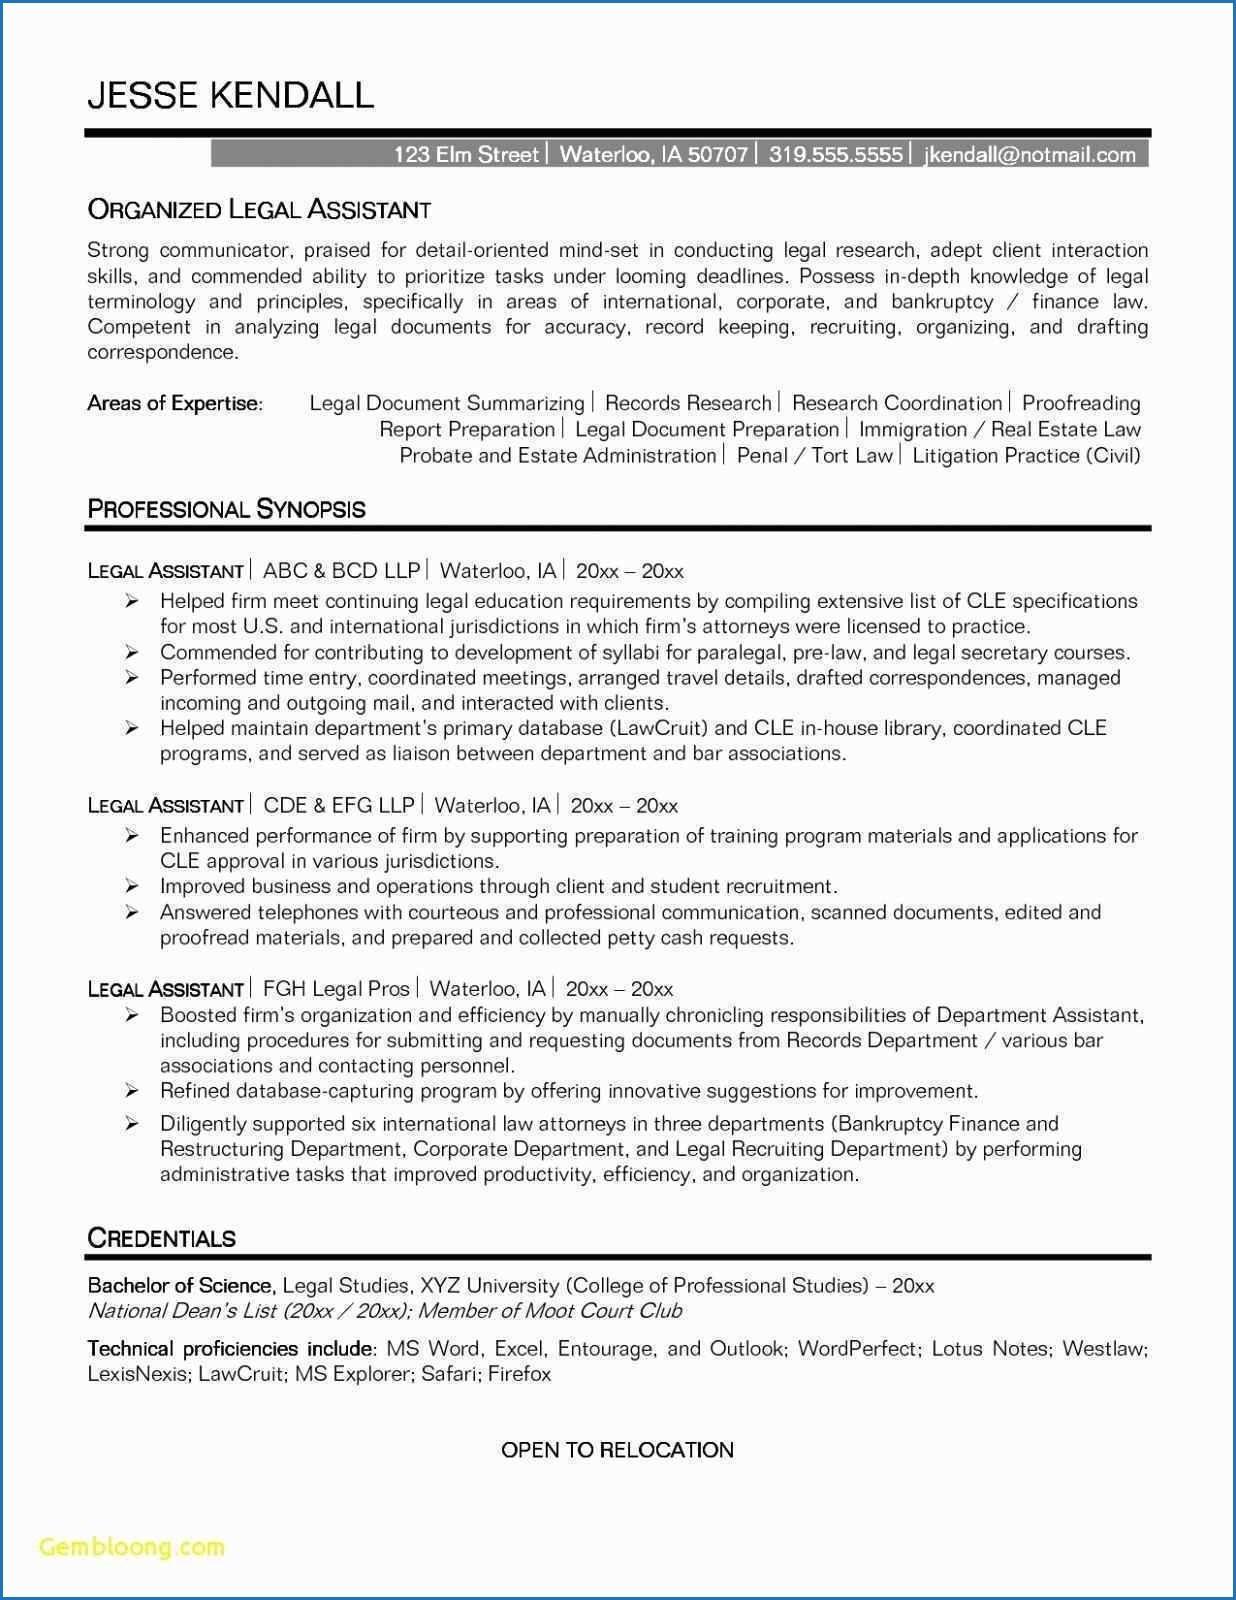 14 Resume Examples For Nursing Home Administrator Check More At Https Www Ortelle Org Resume Examples For Nursing Home Administrator Paralegal